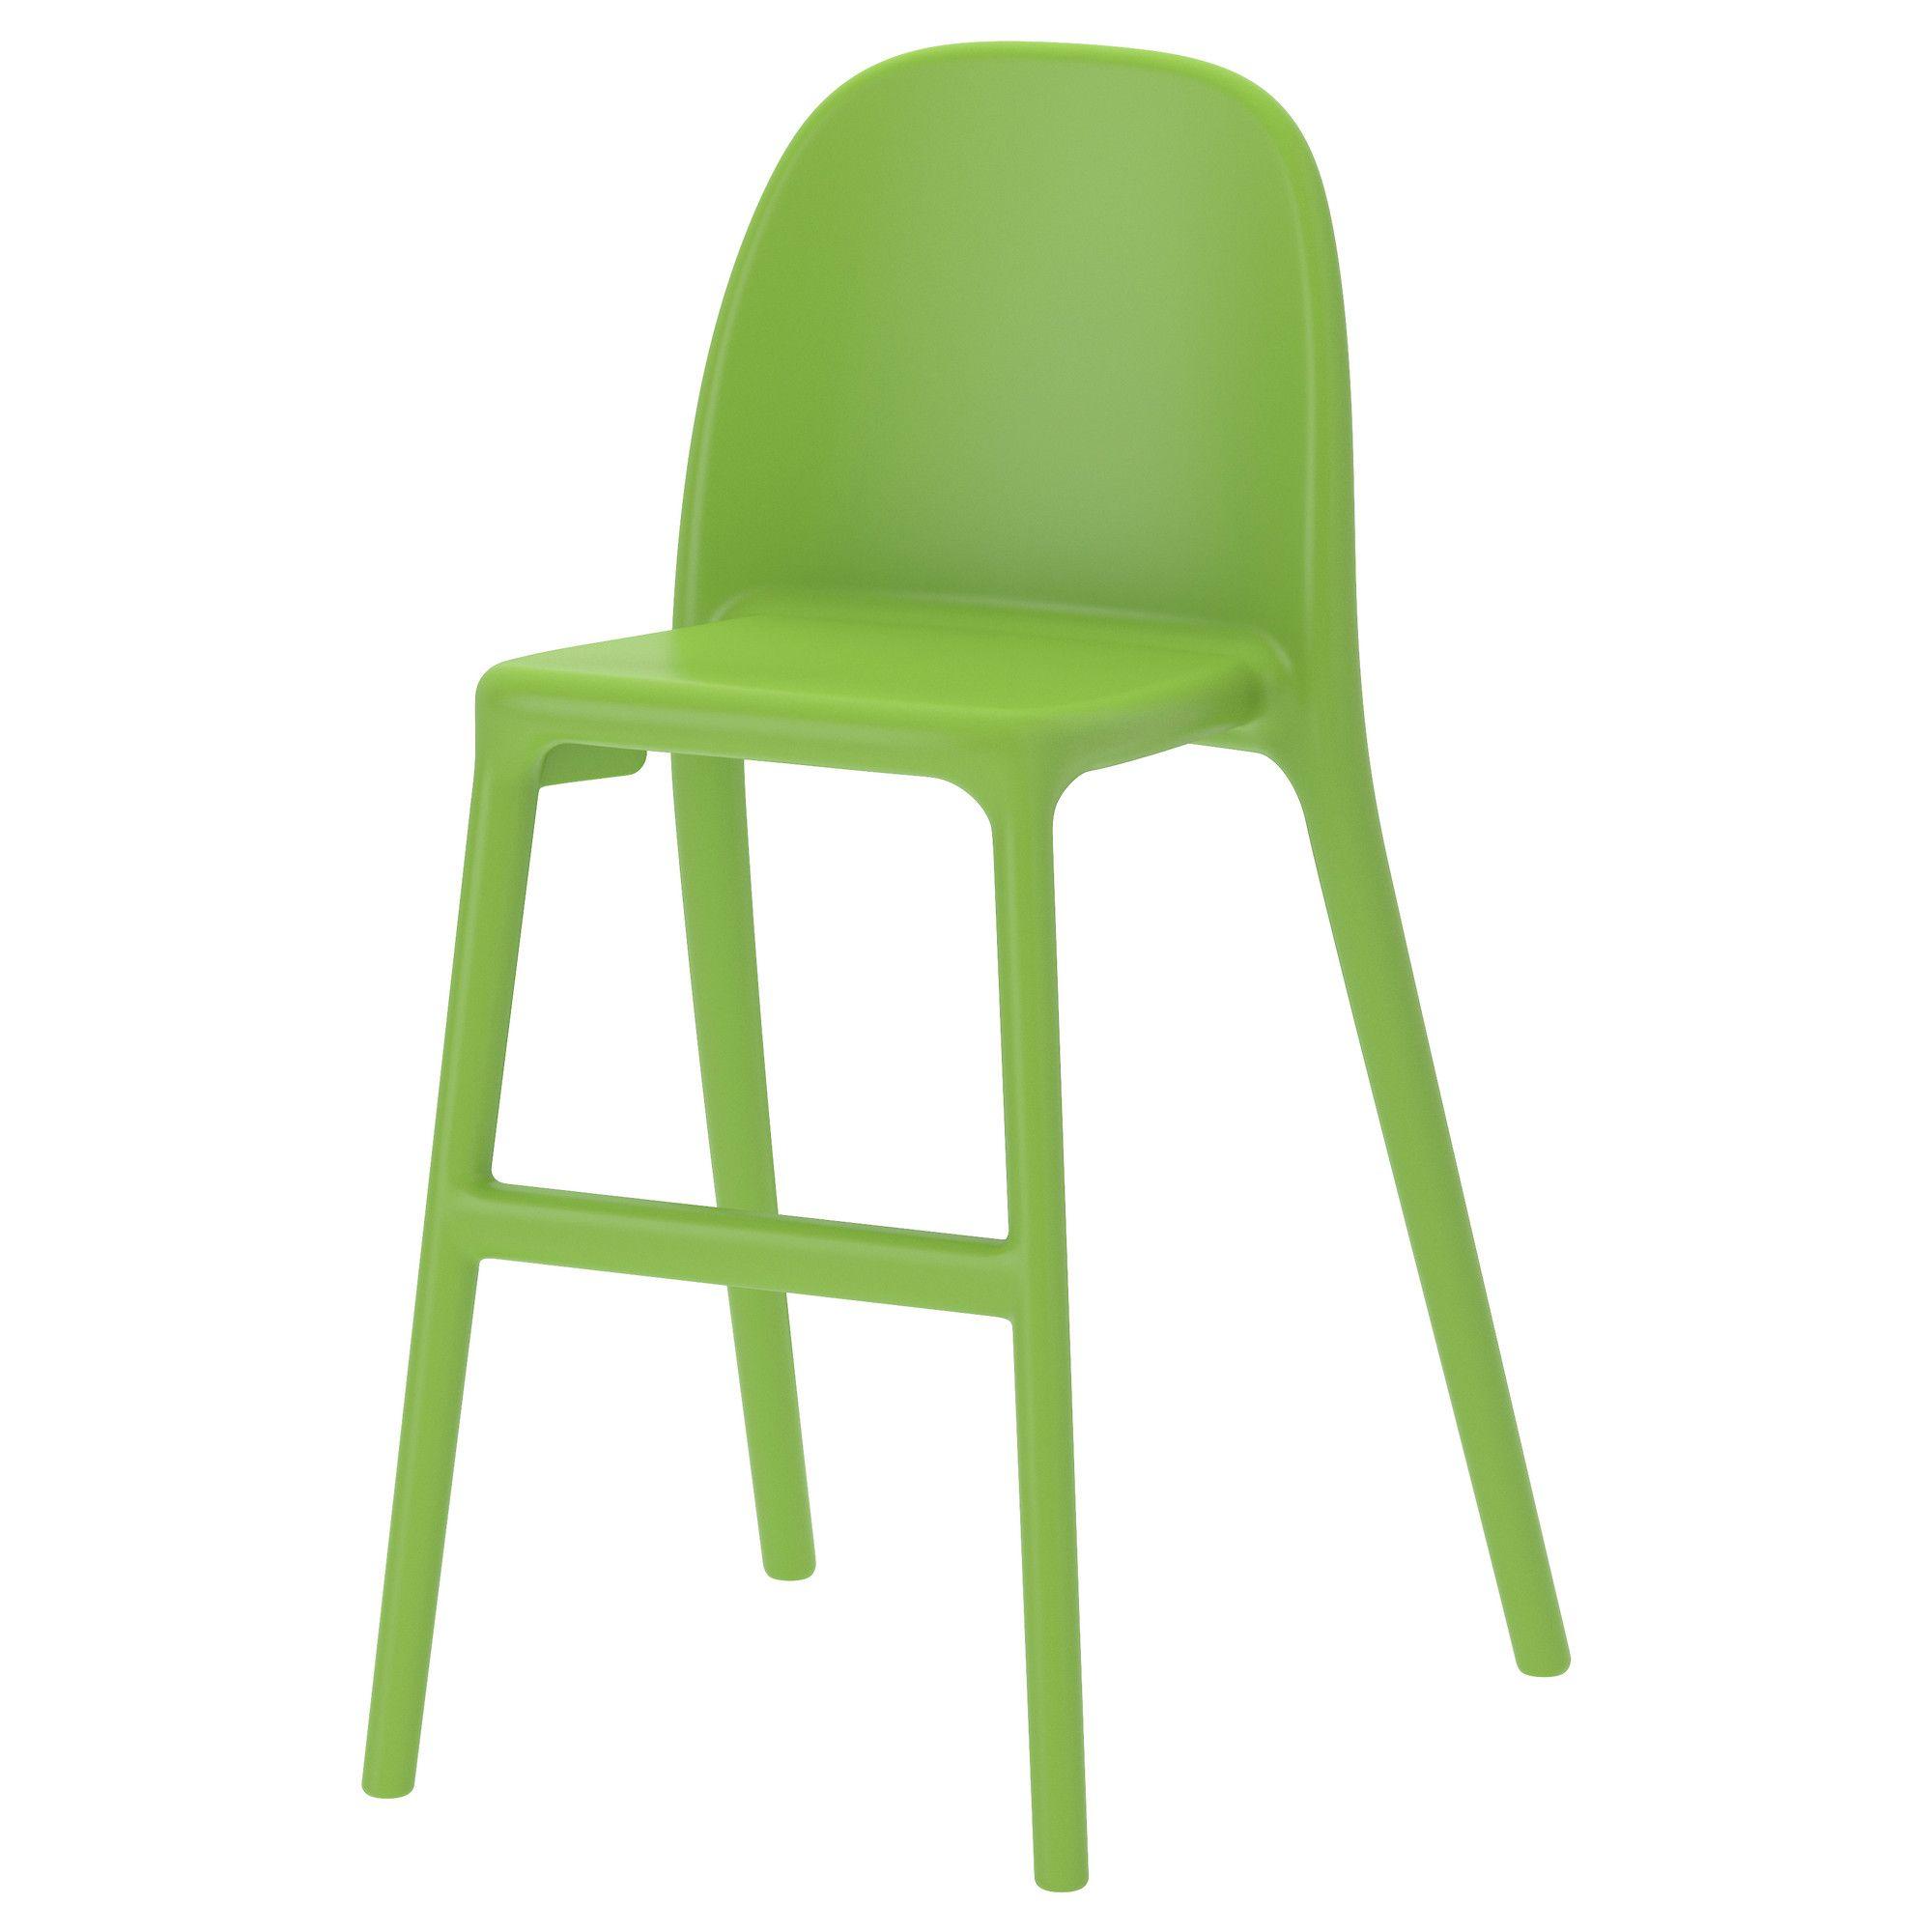 Kinderhochstuhl Ikea kinderhochstuhl grün ikea the future of c25